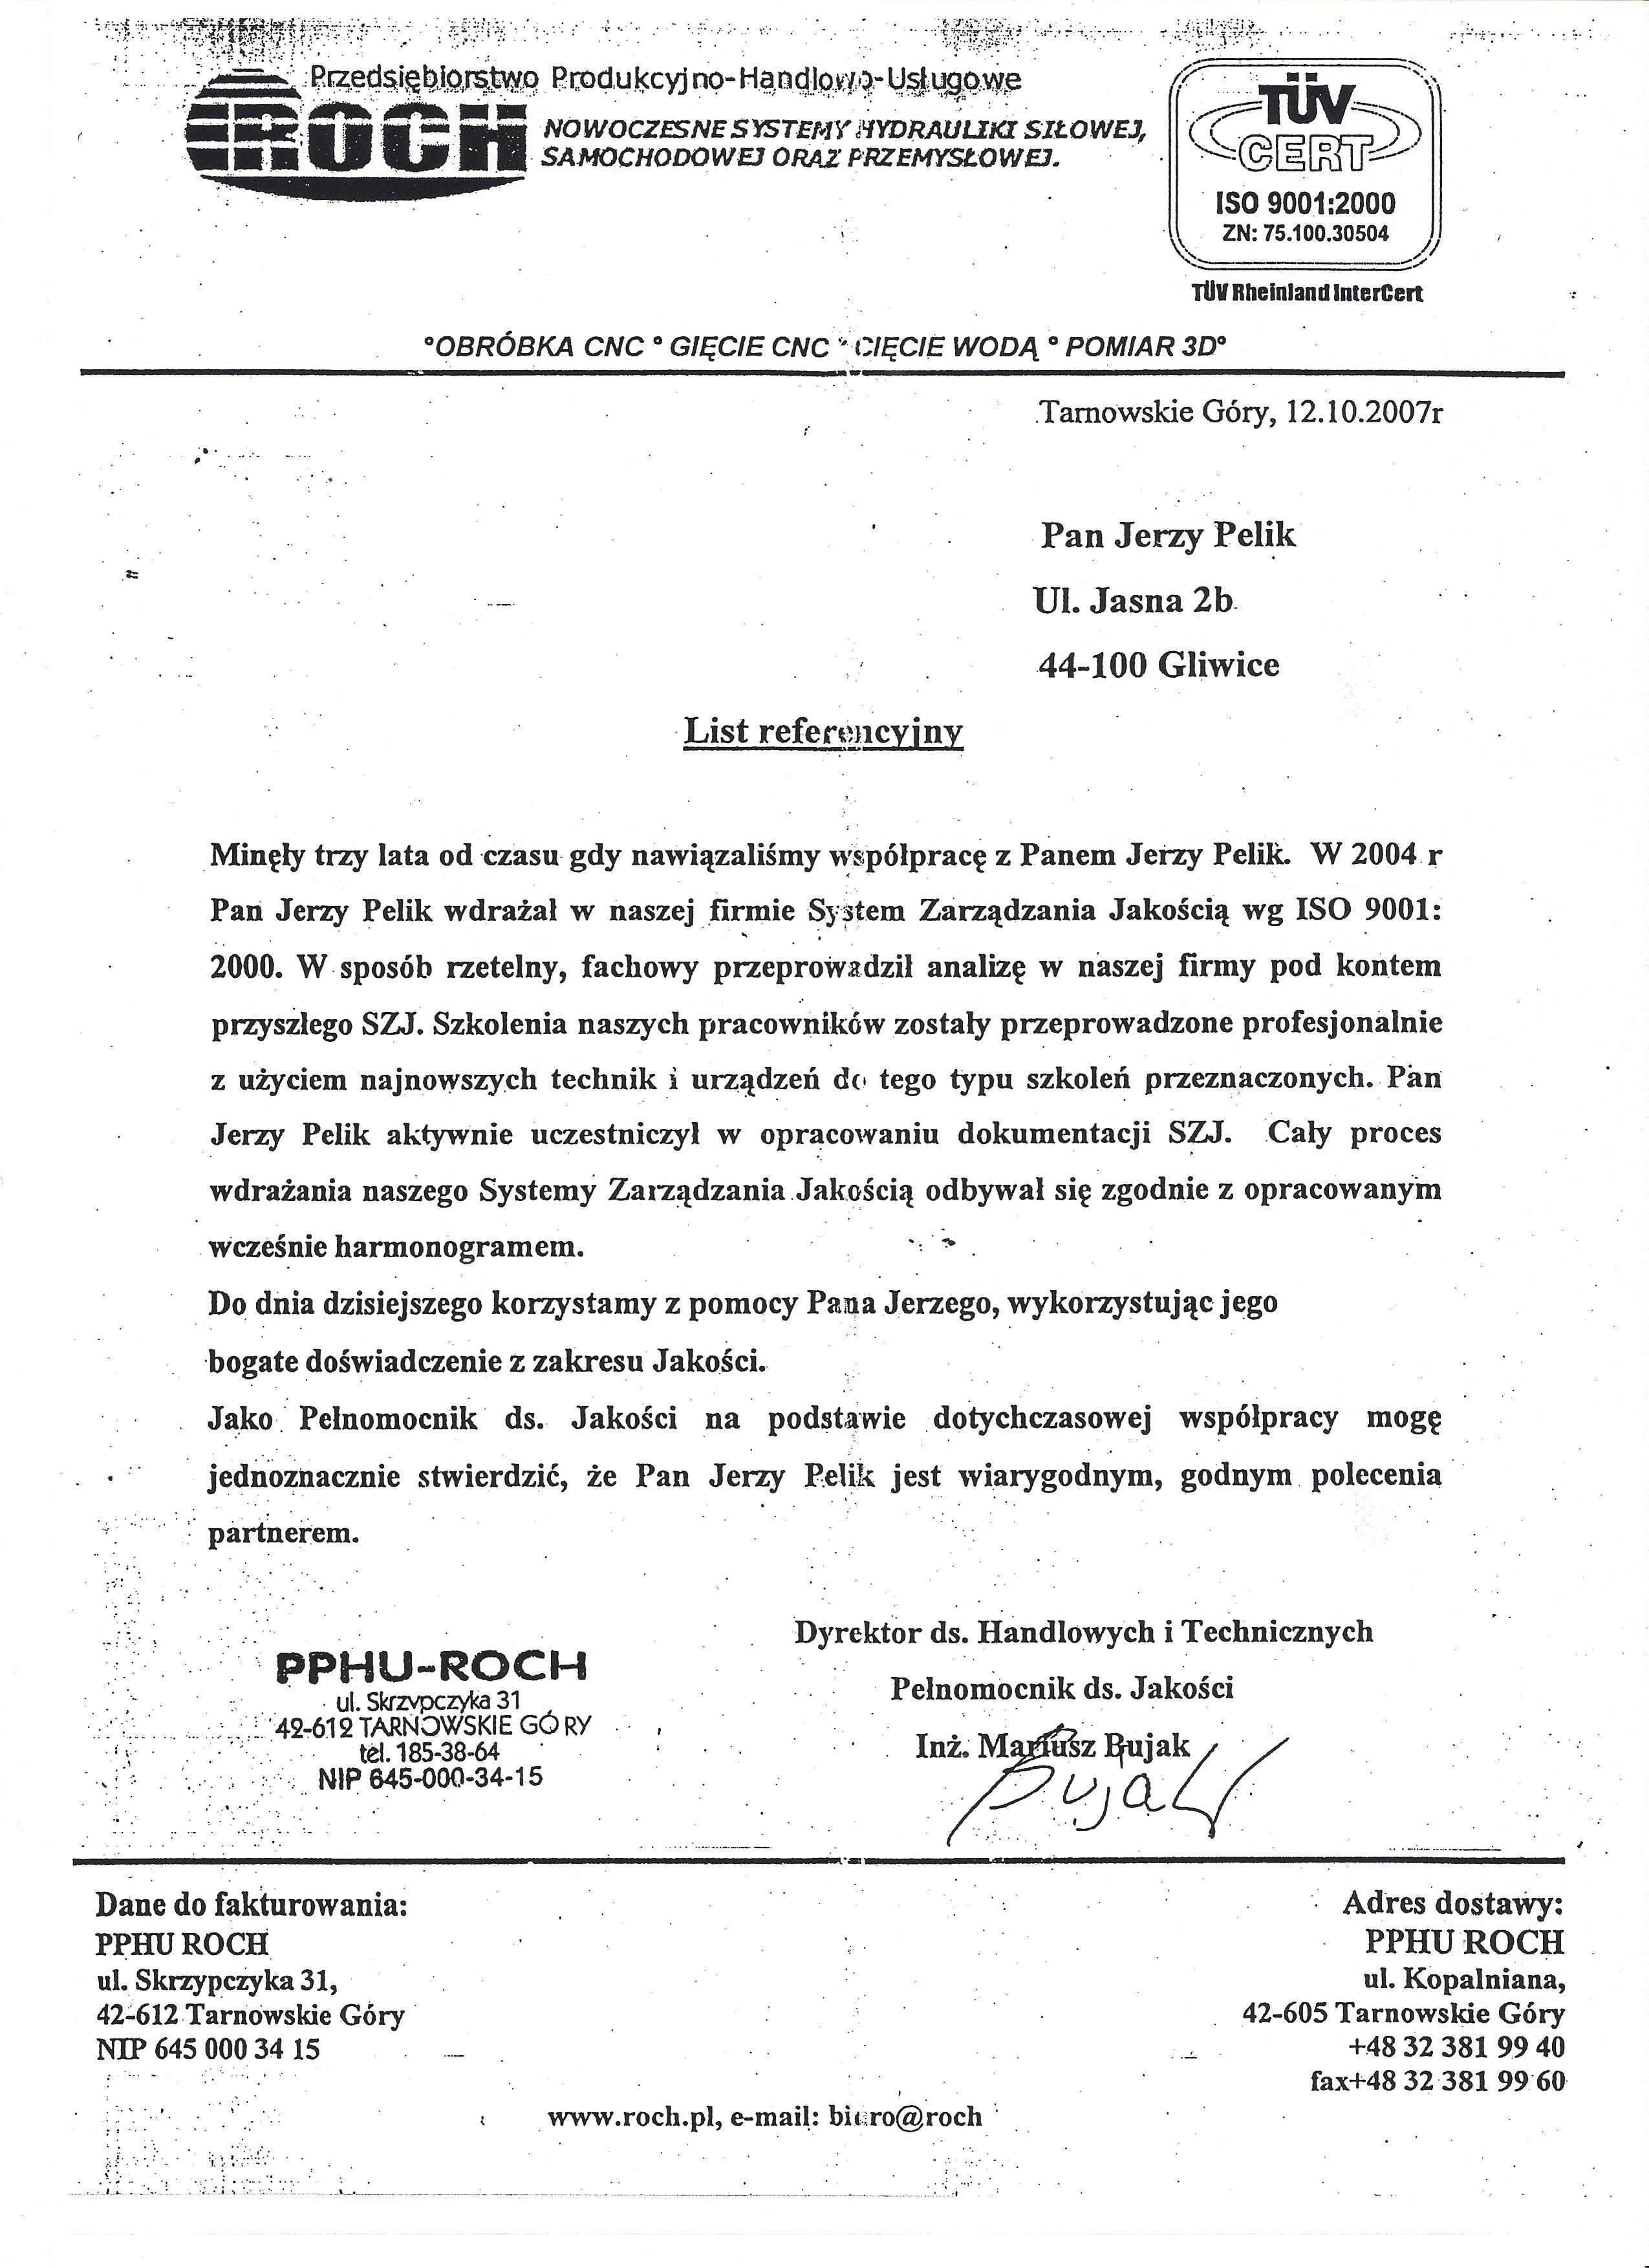 PPHU Roch